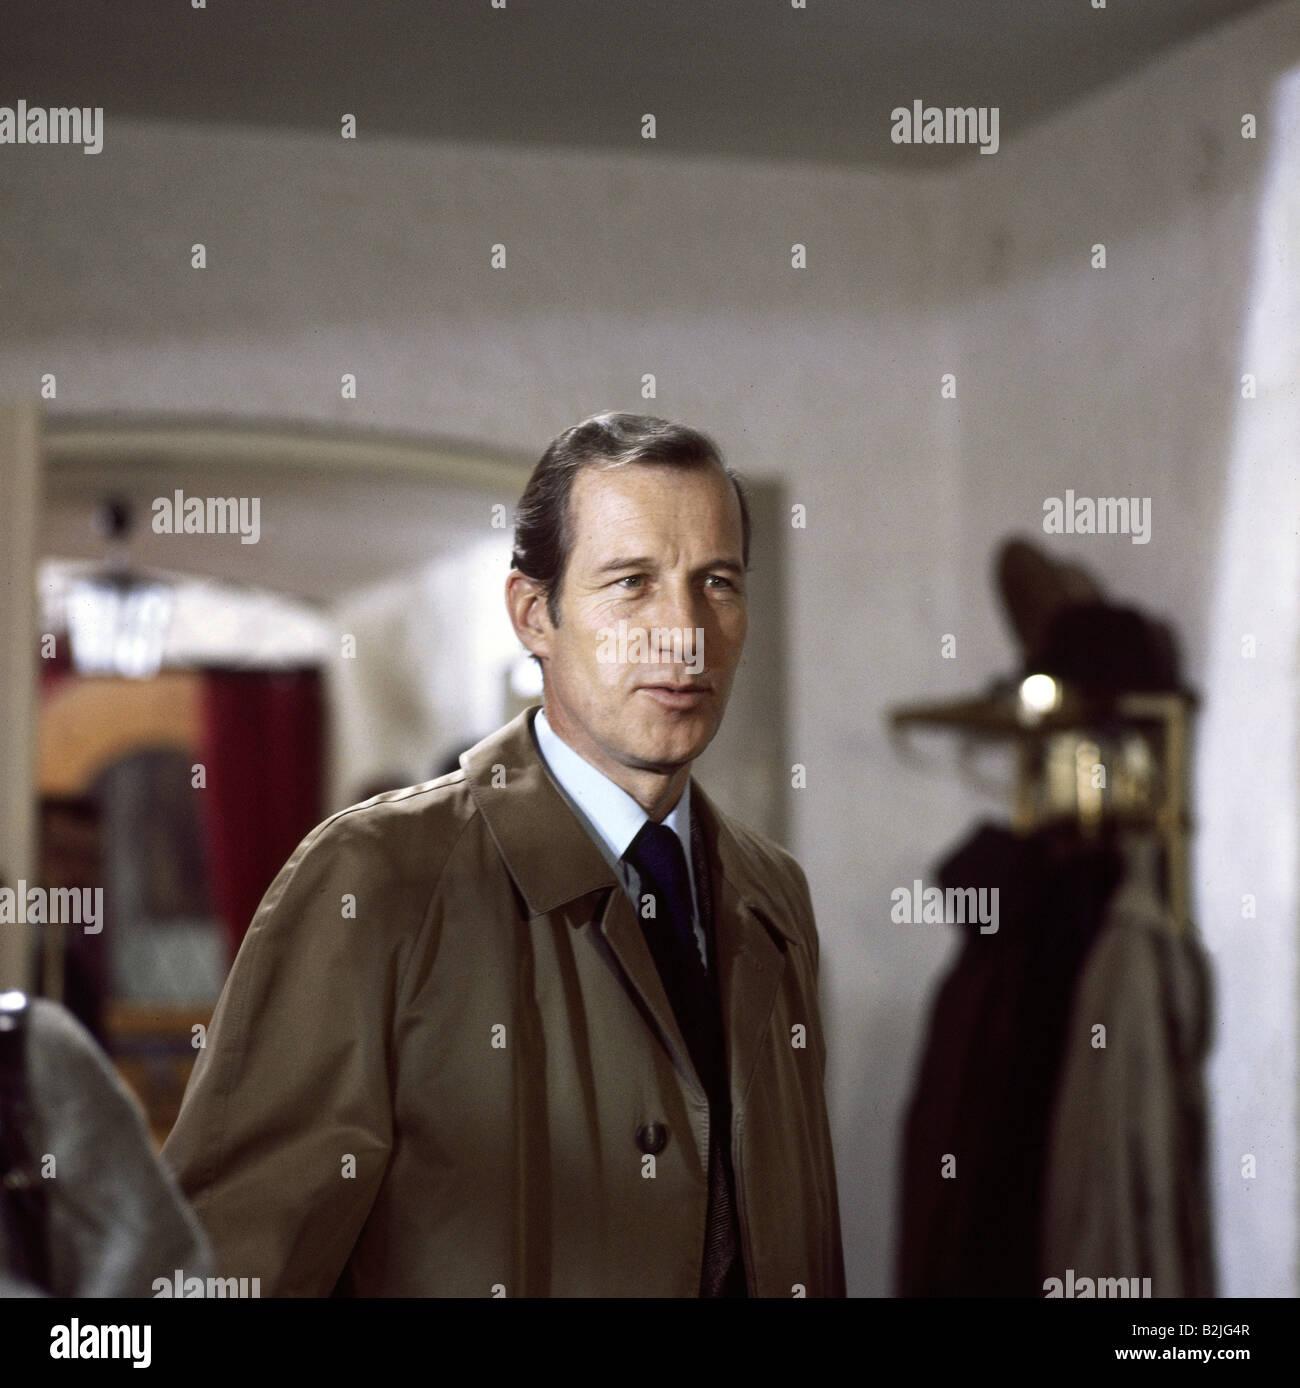 "Felmy, Hansjörg * 31.1.1931, acteur allemand, série télé, ""Tatort"", l'épisode Photo Stock"